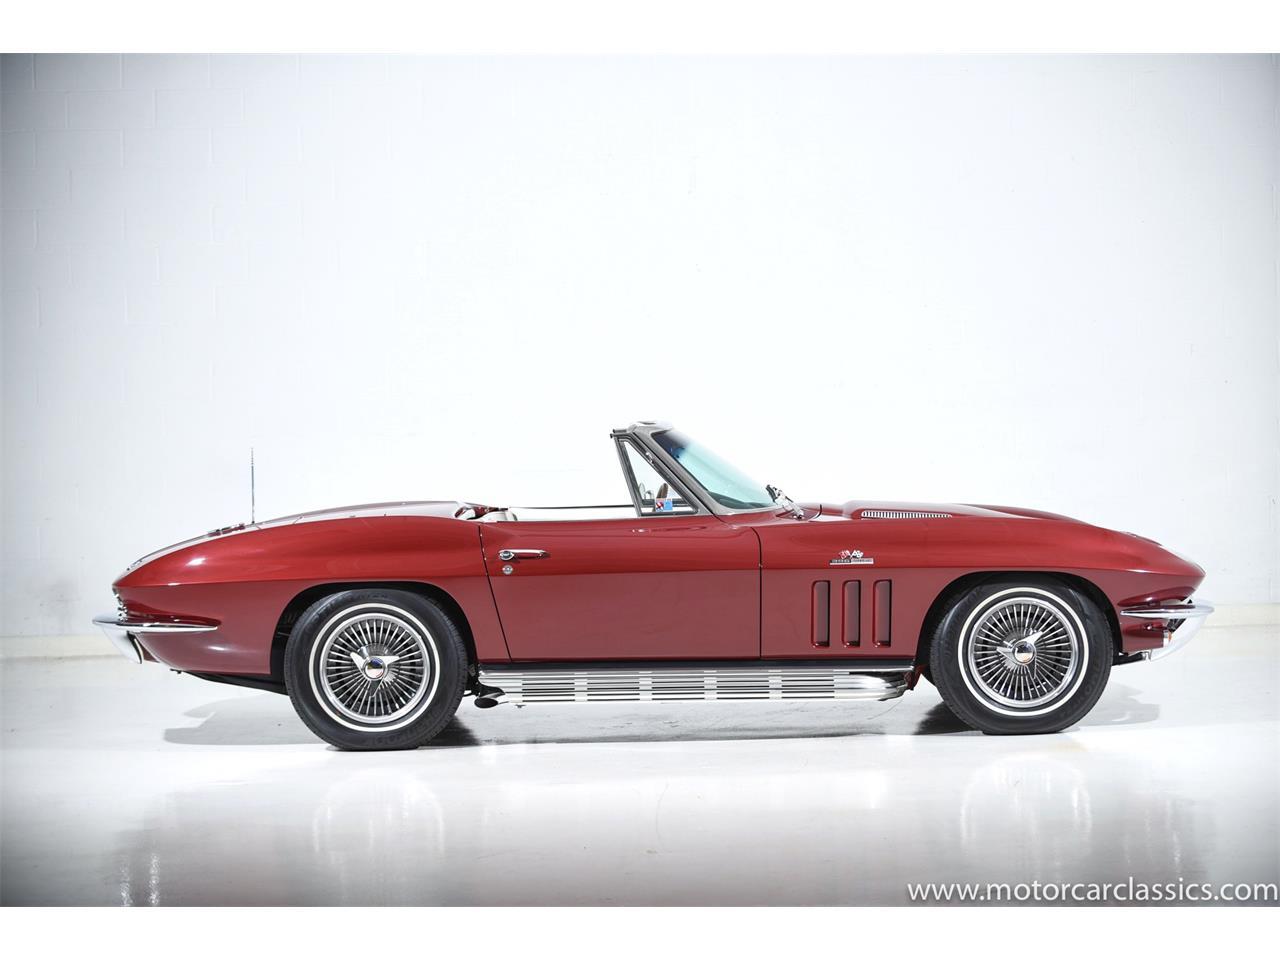 Large Picture of Classic '65 Corvette located in New York - $167,900.00 - PR15